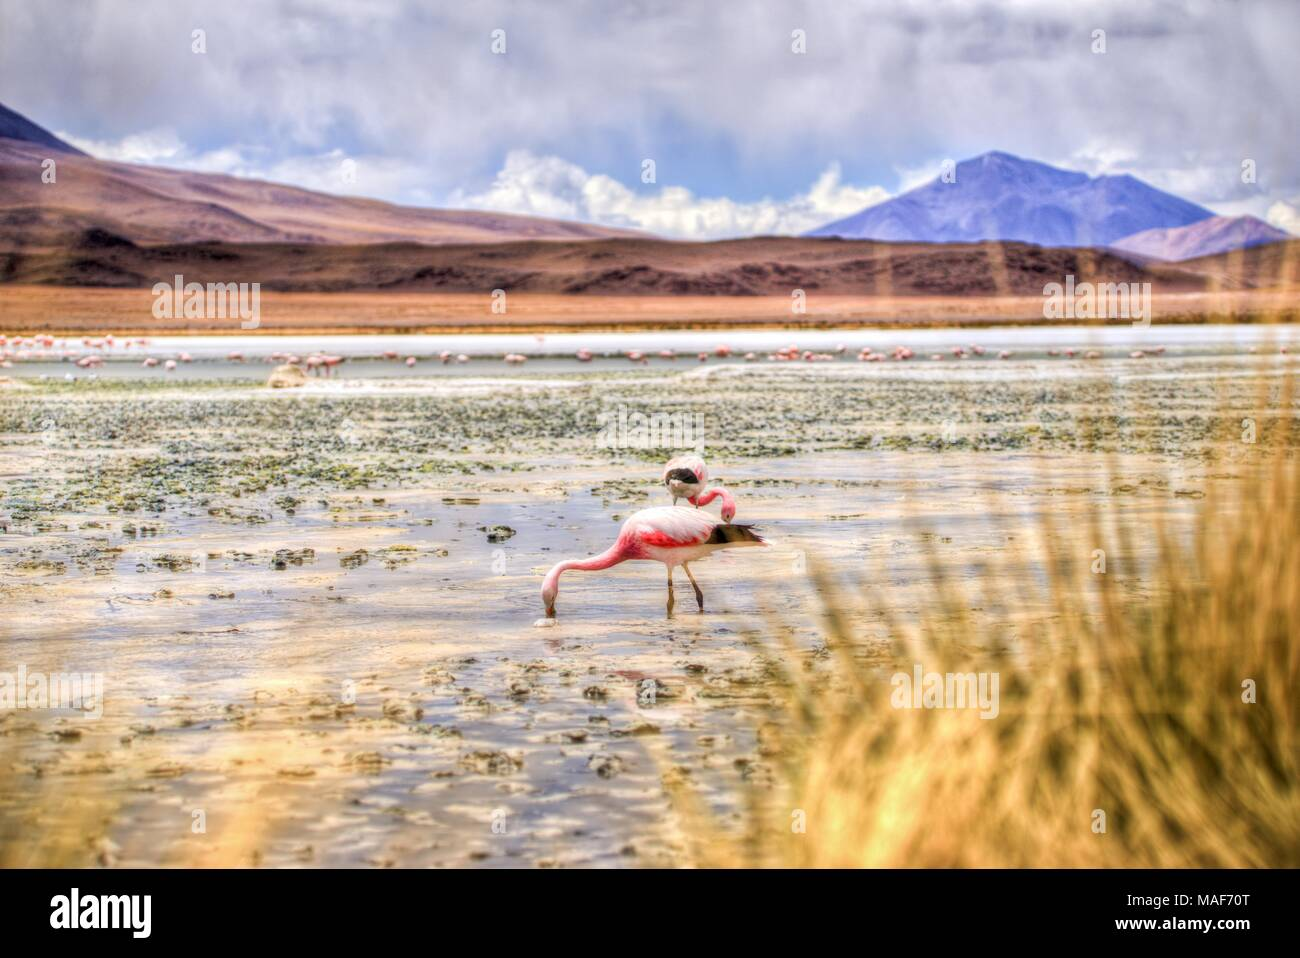 Laguna en el altiplano de Bolivia, Sudamérica Imagen De Stock